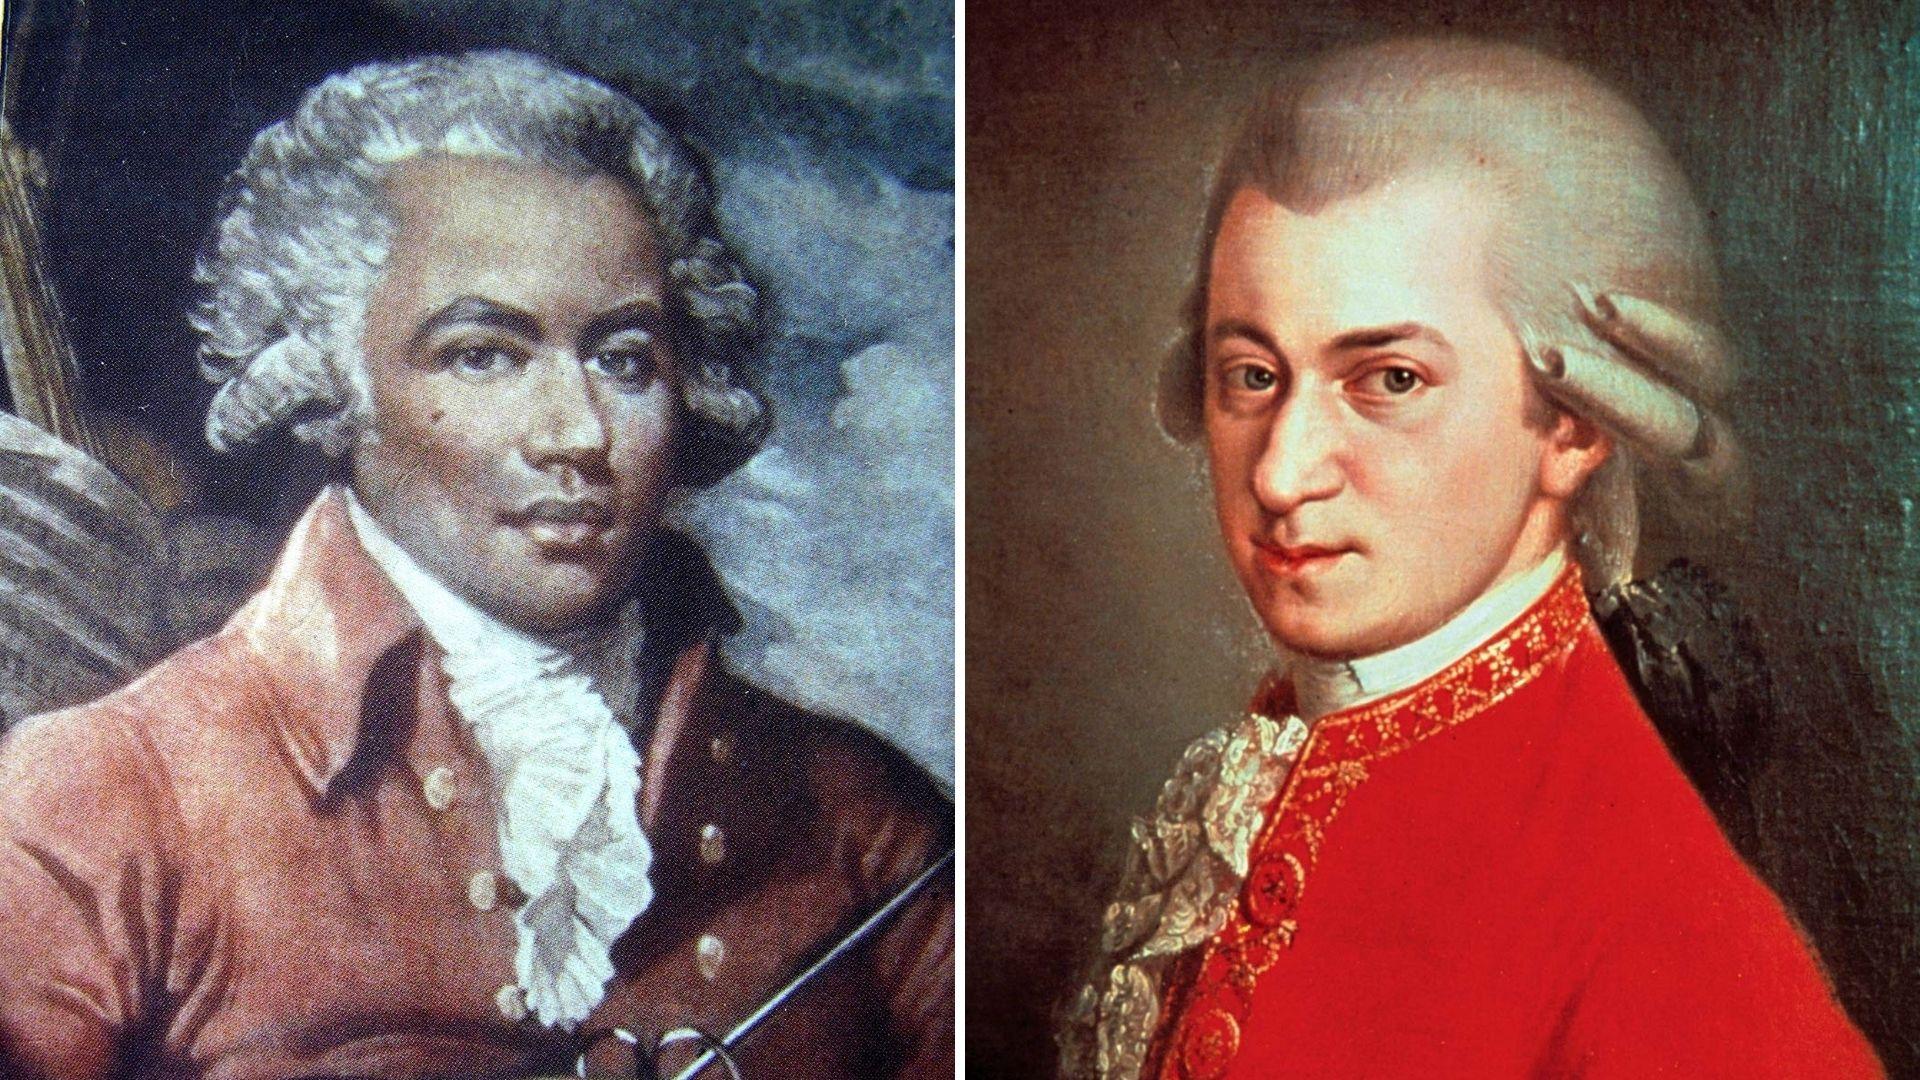 Chevalier de Saint-Georges & Mozart I & II